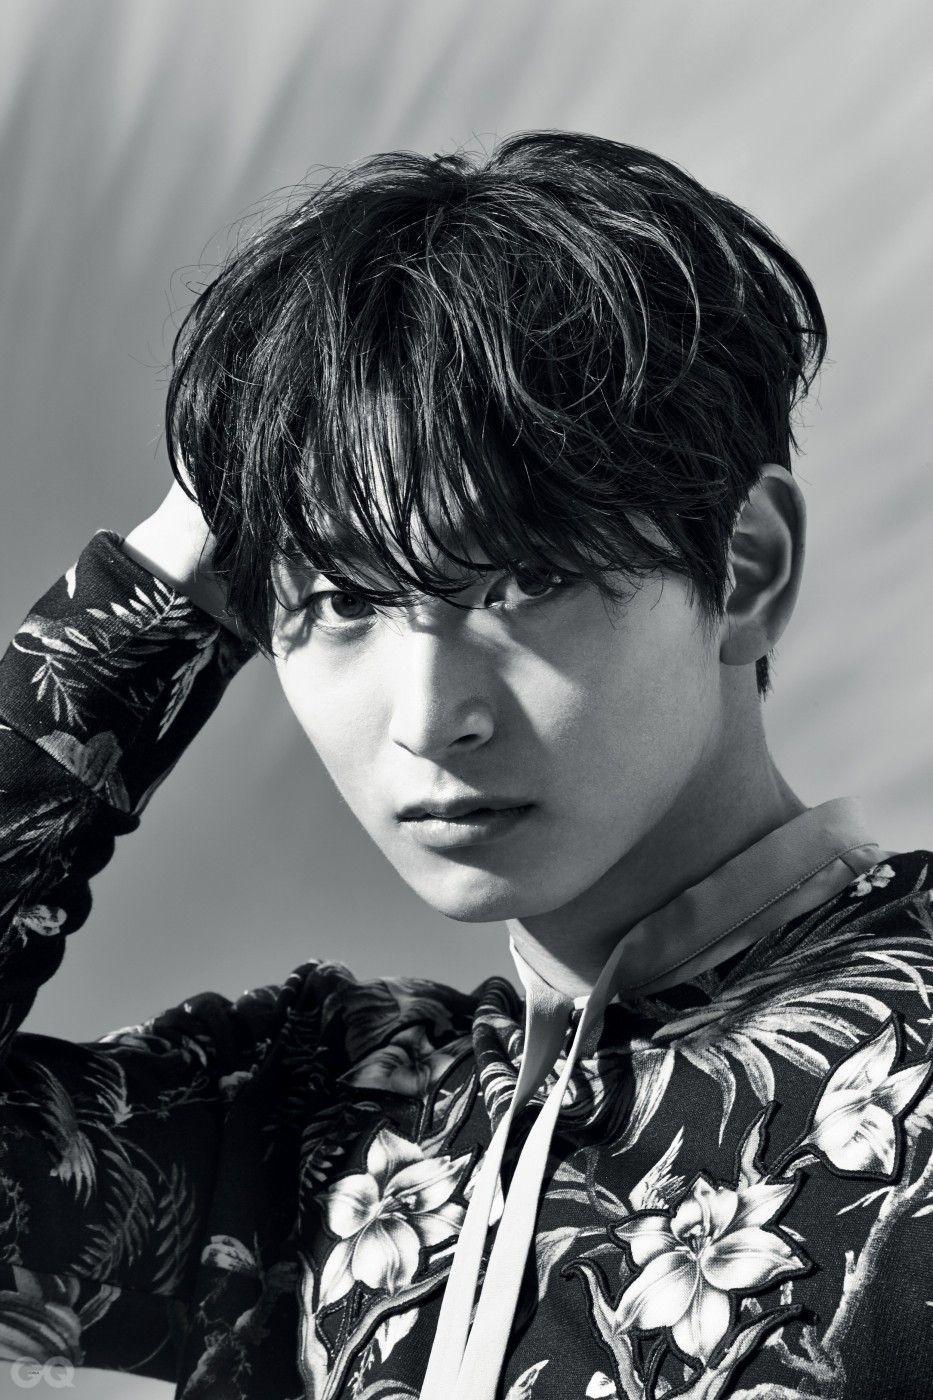 Jinwoon (2AM) - GQ Magazine July Issue '16